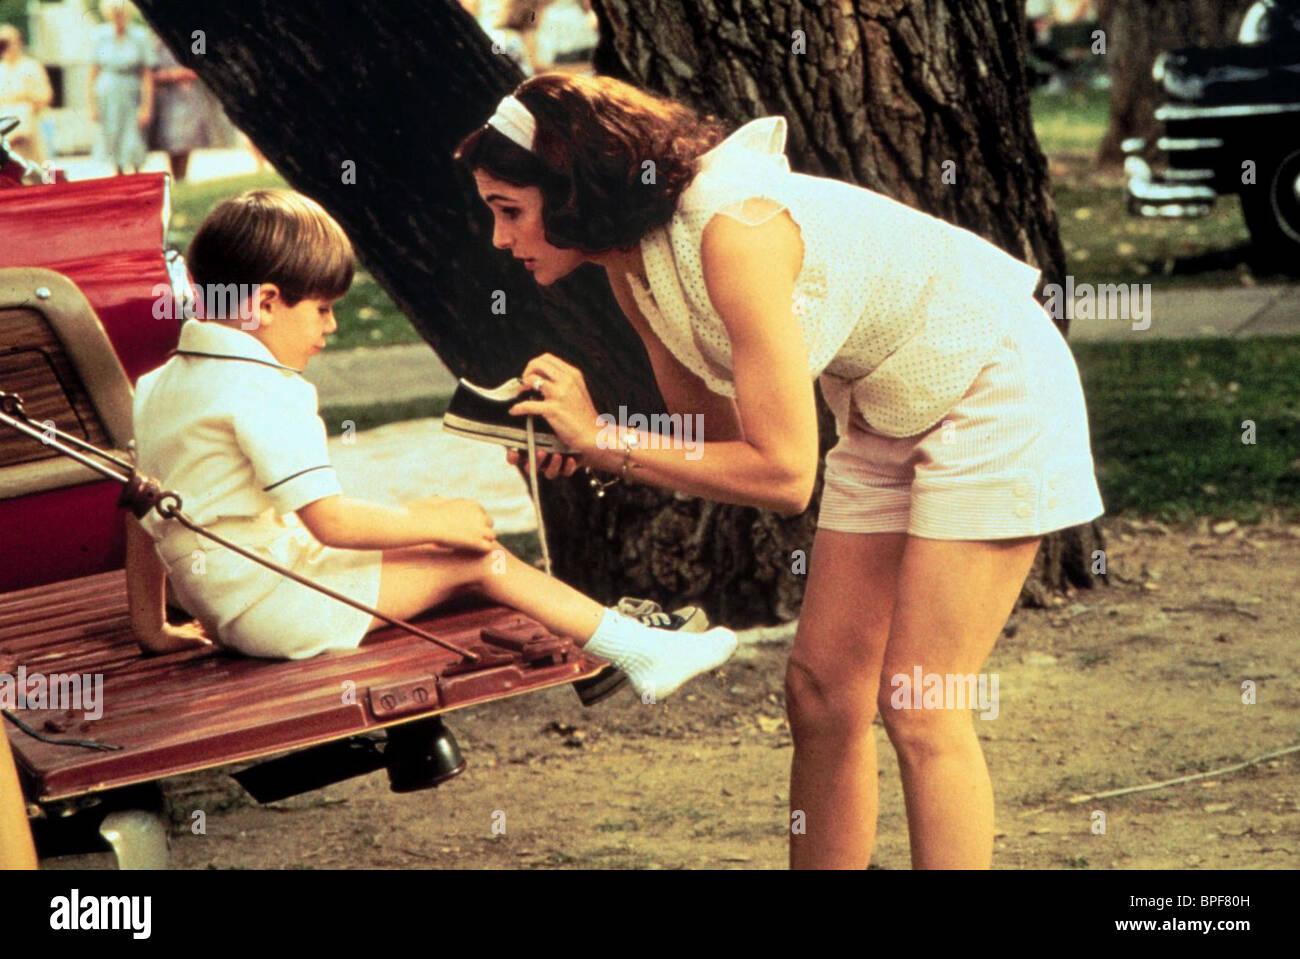 SETH MUMY & MARY ELIZABETH MASTRANTONIO THREE WISHES (1995) - Stock Image